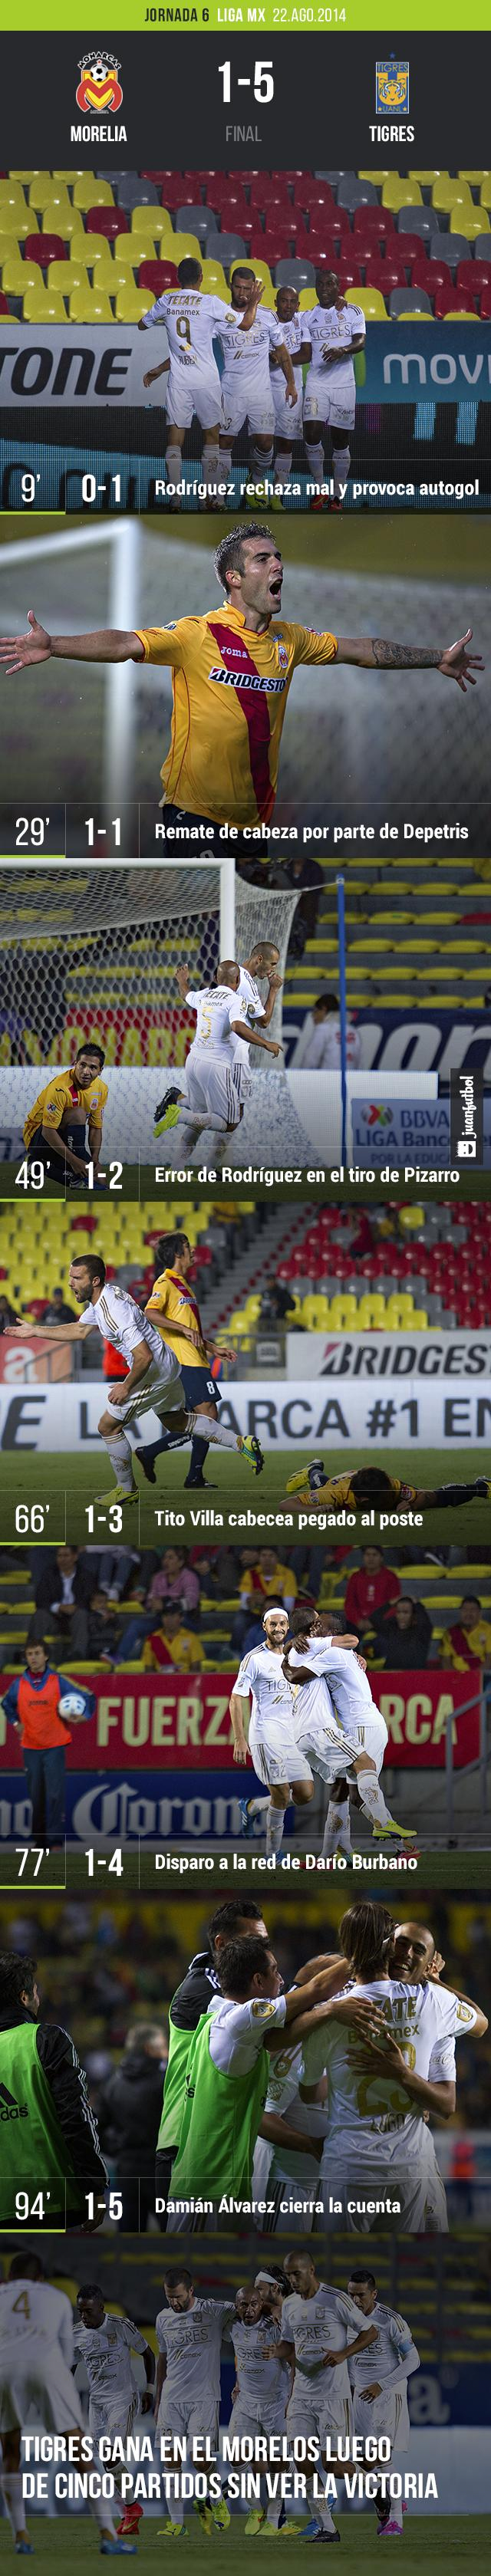 Morelia 1-5 Tigres